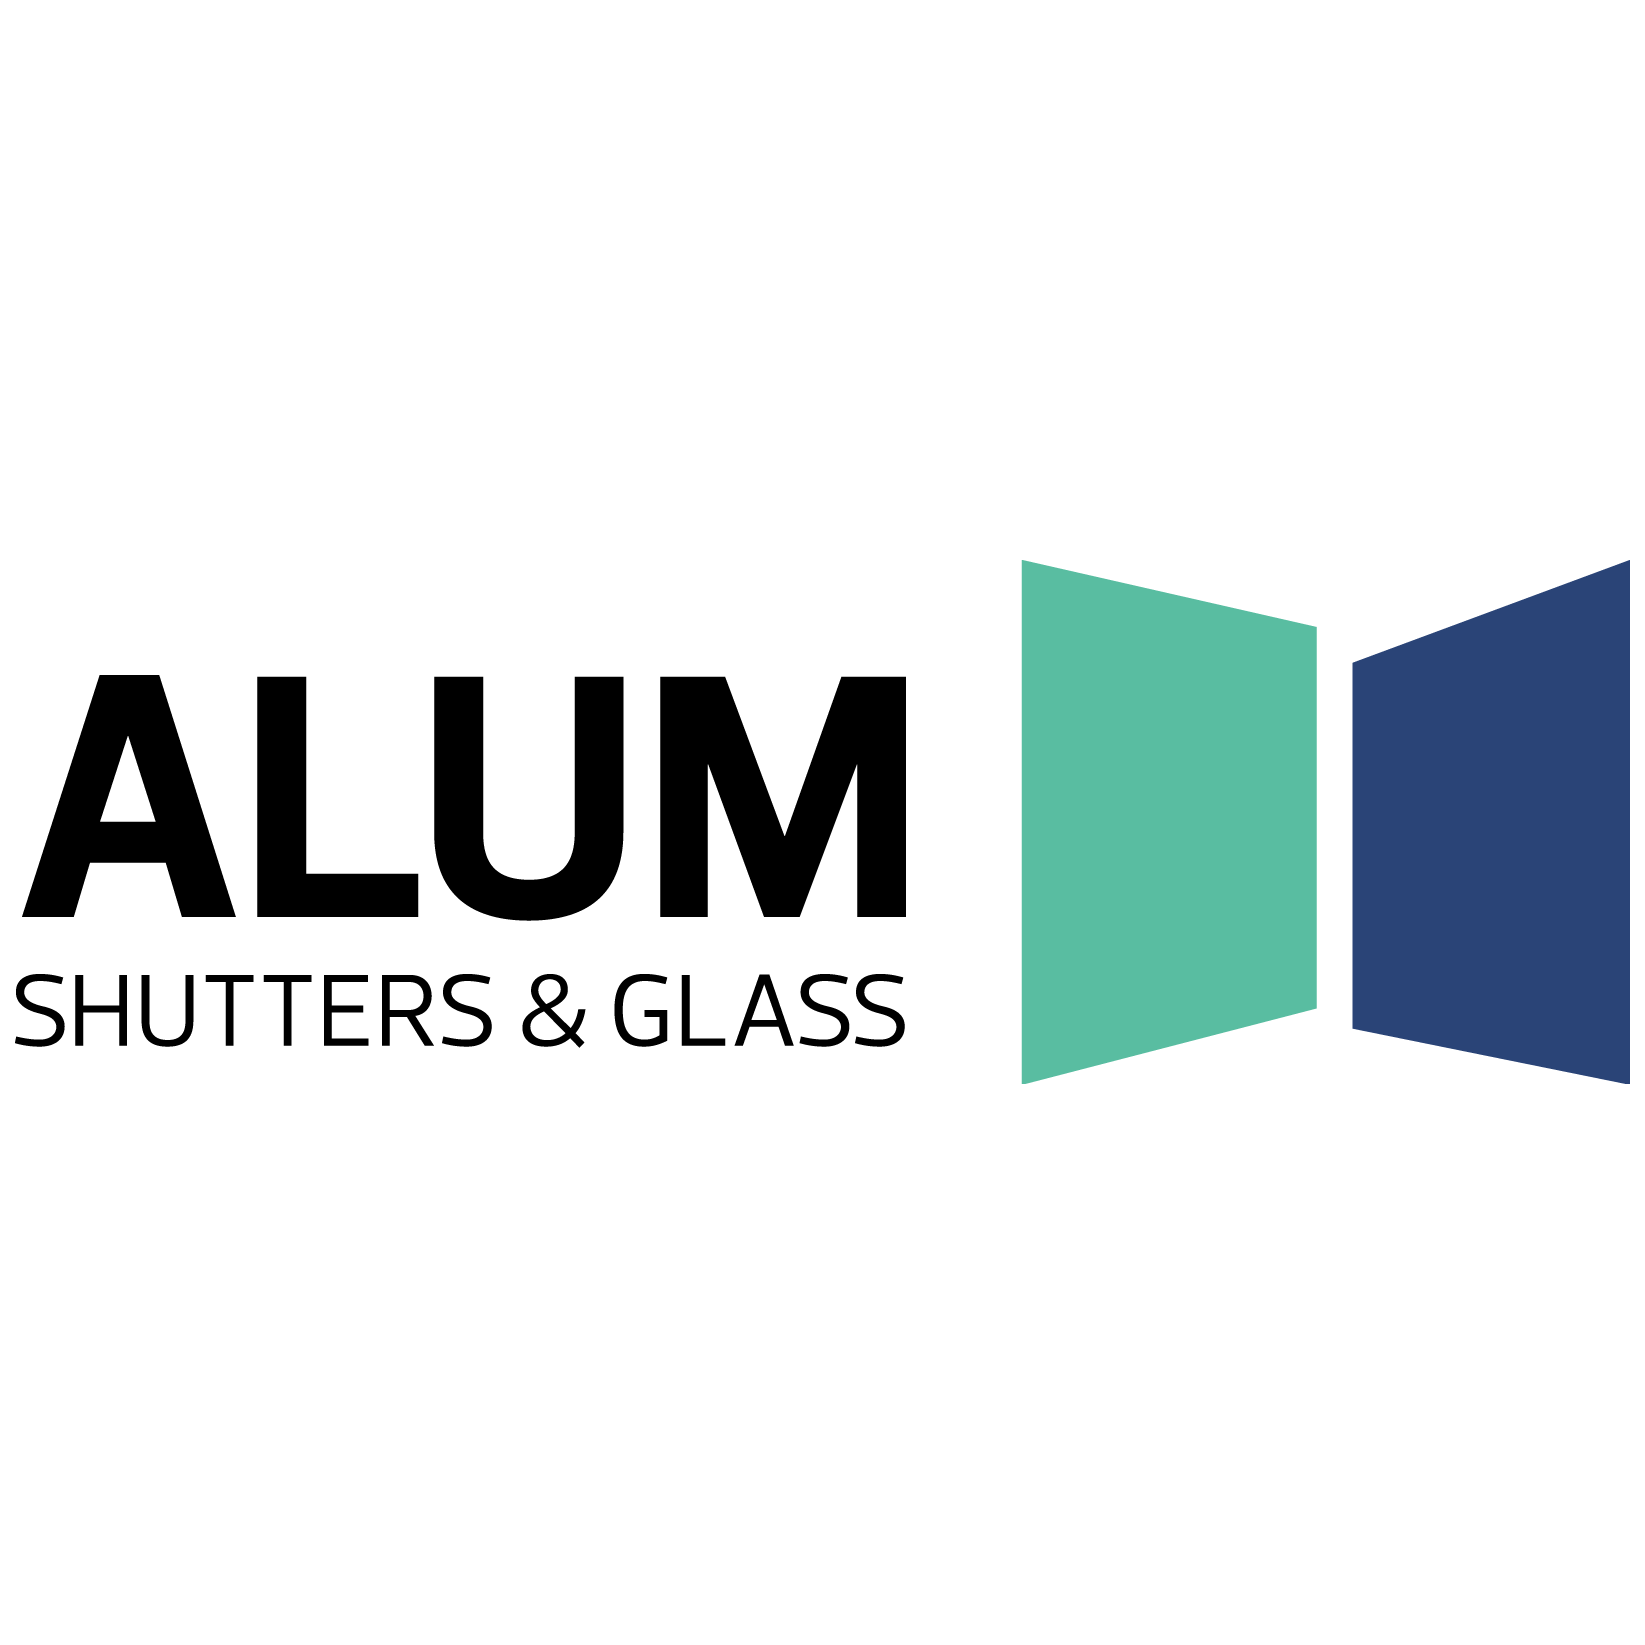 Alum Shutters and Glass - Hialeah, FL 33016 - (305)819-5555 | ShowMeLocal.com